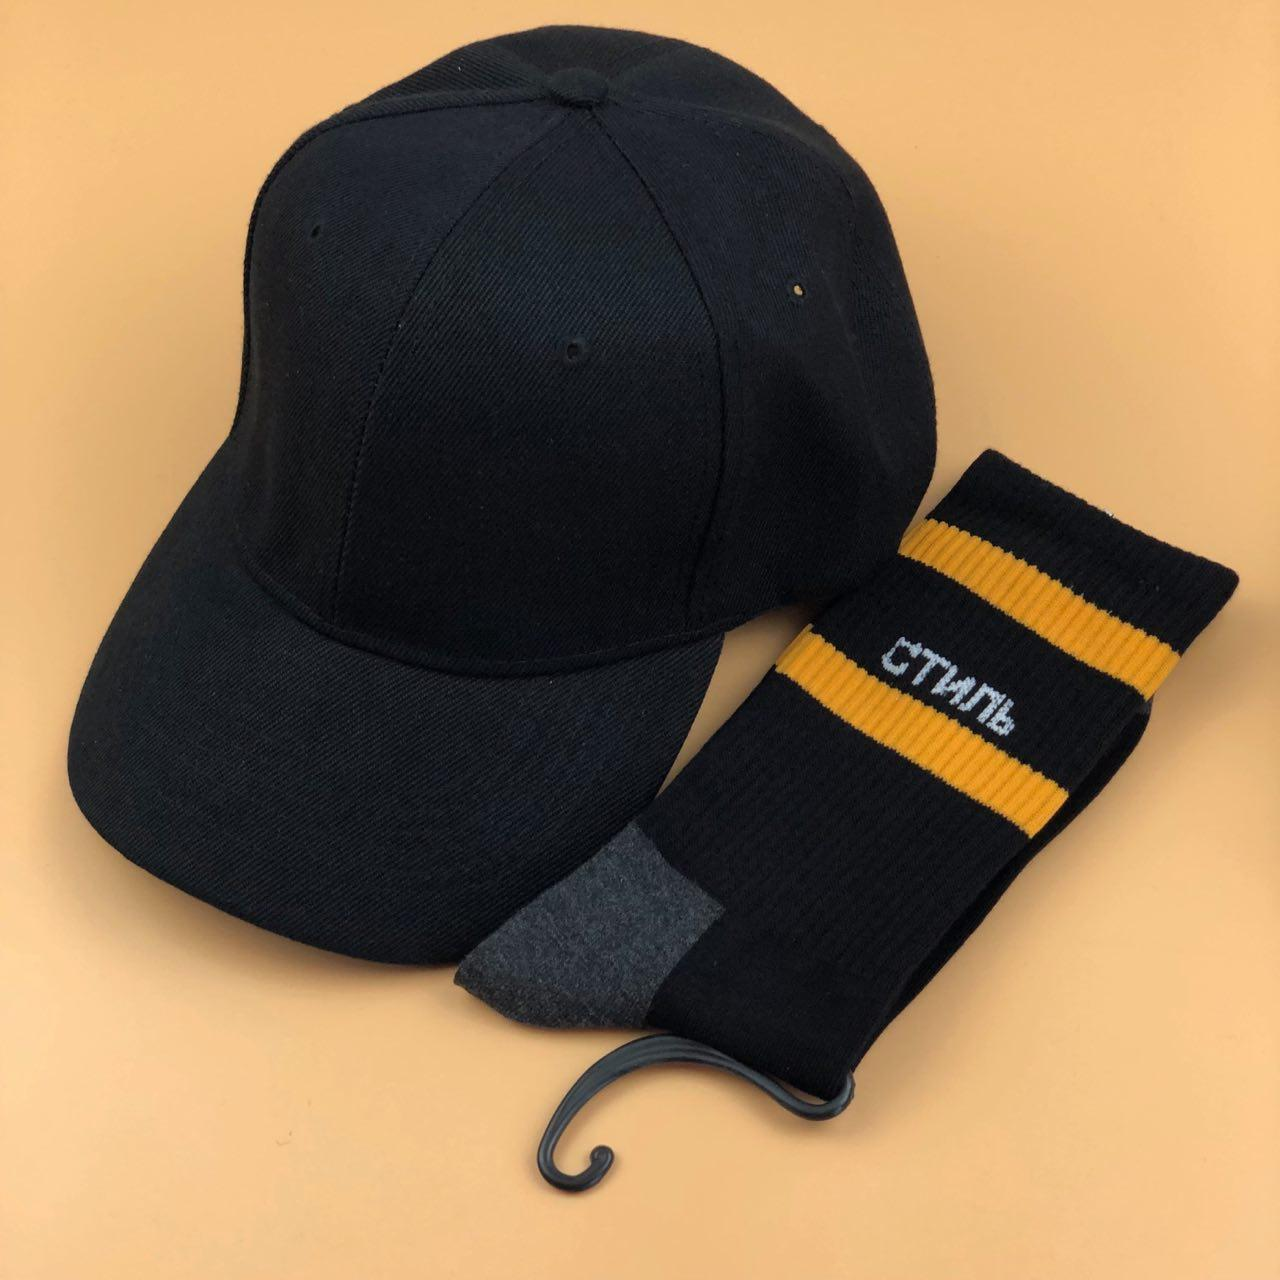 Комплект Кепка бейсболка Style (черная) + носки Стиль Heron Preston